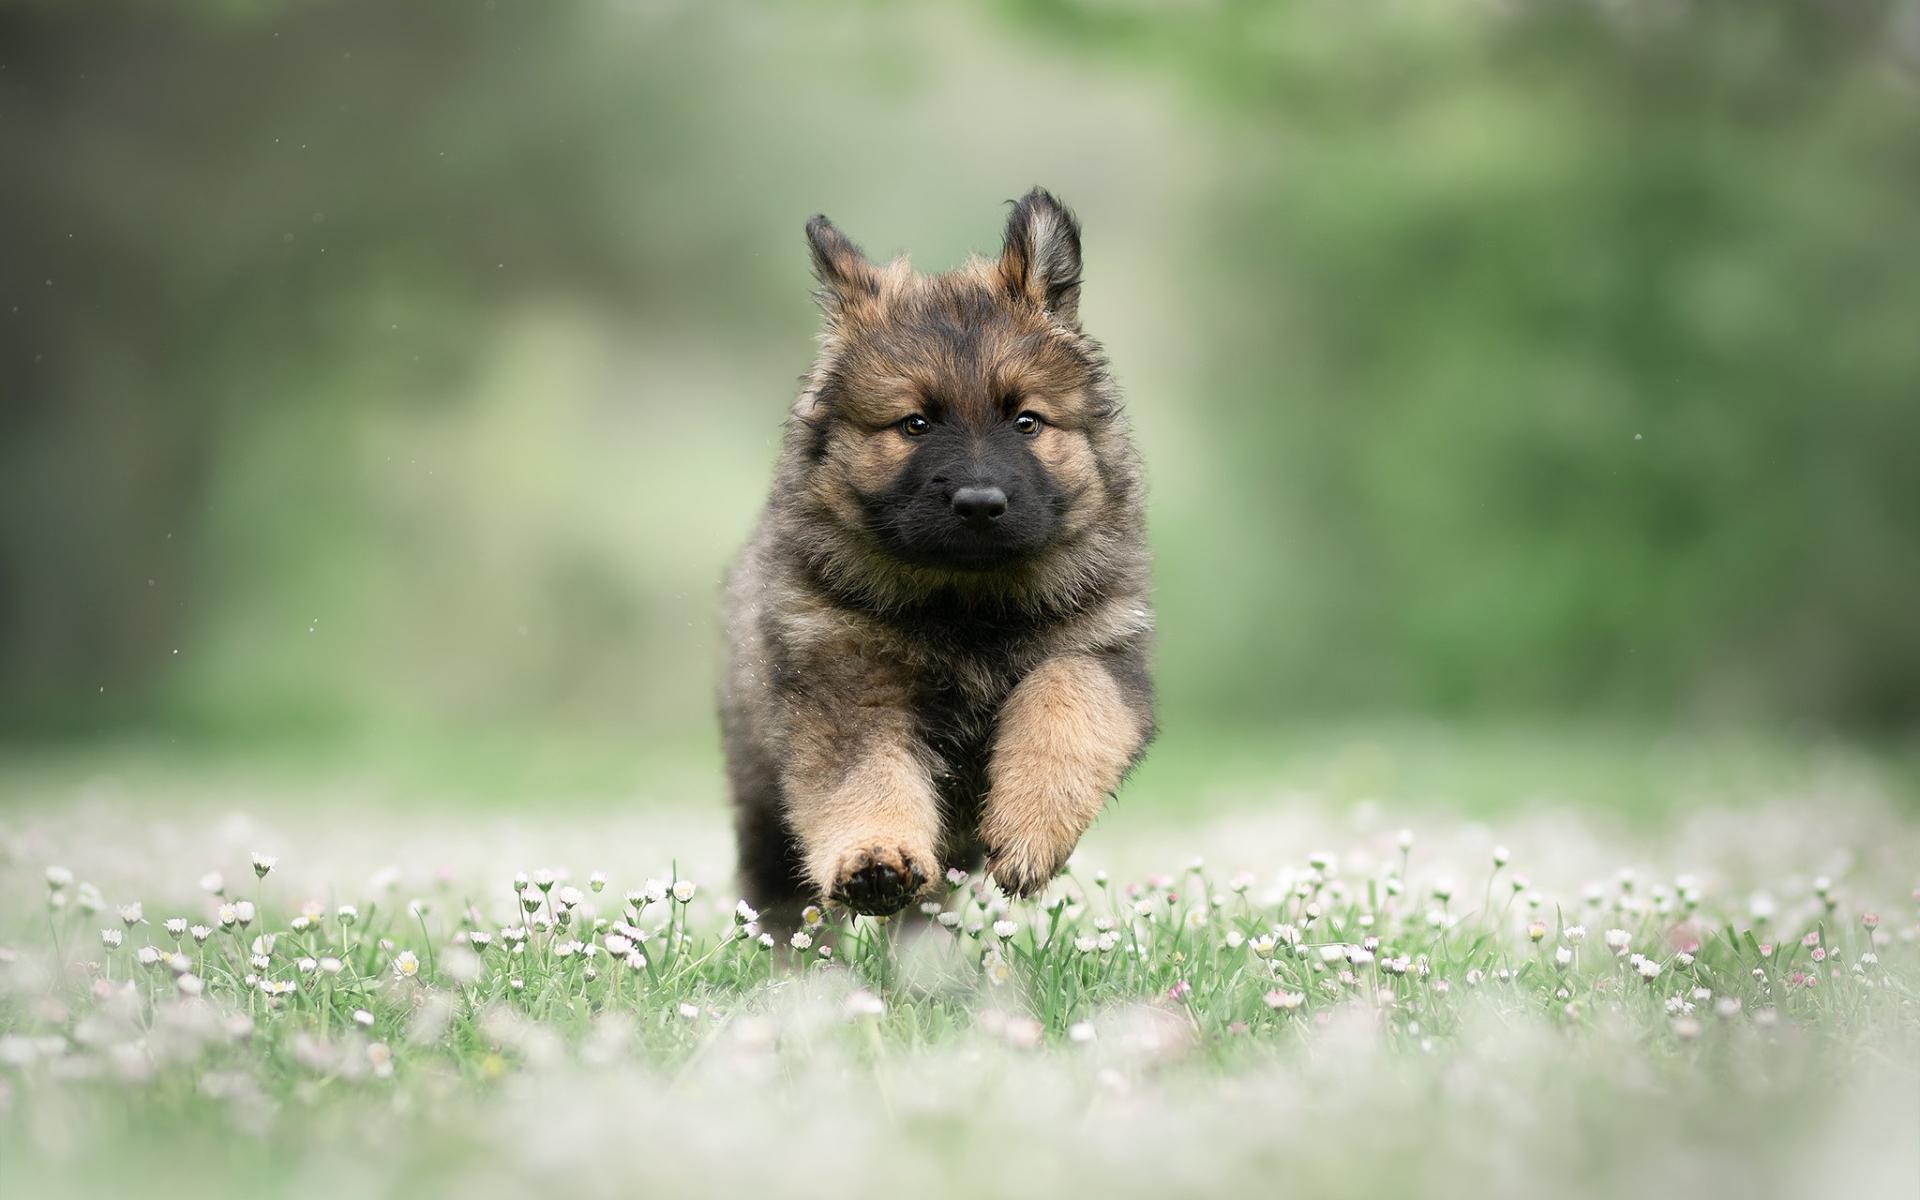 Running German Shepherd Puppy Summer Pets Cute German Shepherd Baby Dog 1920x1200 Download Hd Wallpaper Wallpapertip